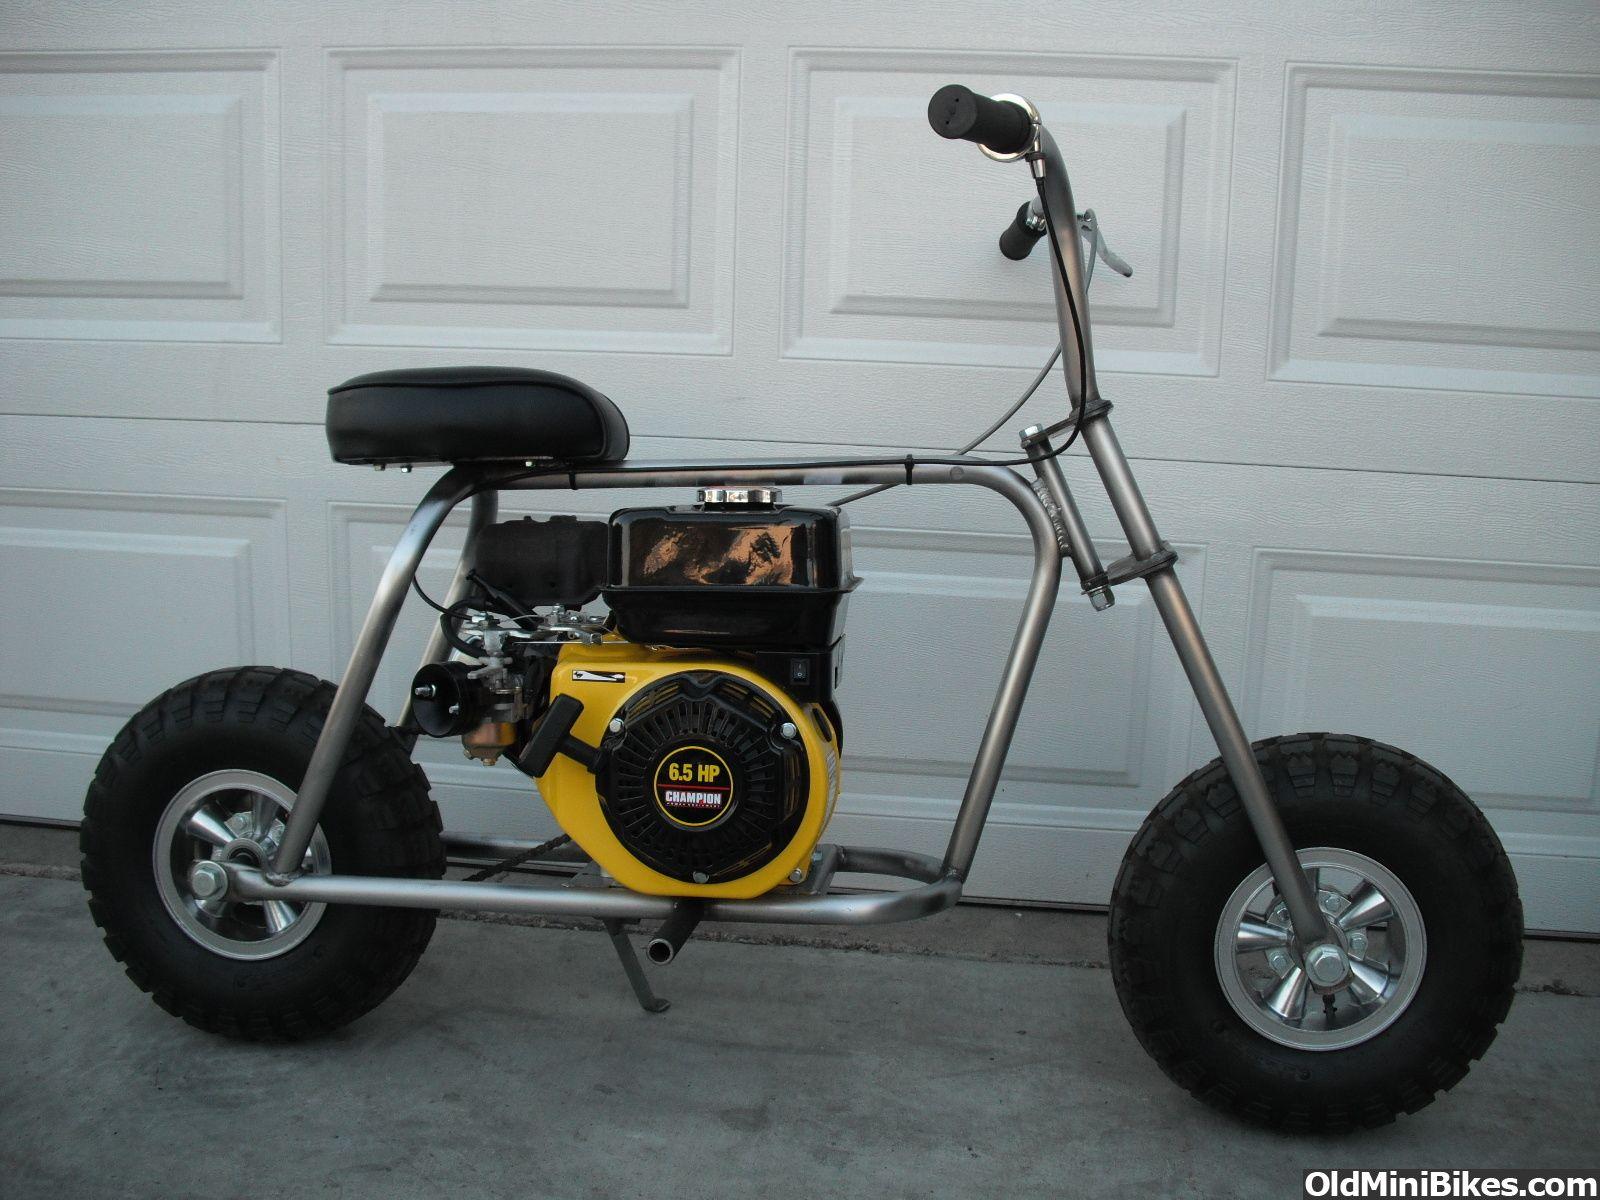 dscf1567jpg 16001200 diymini bikemotorcyclesentrance